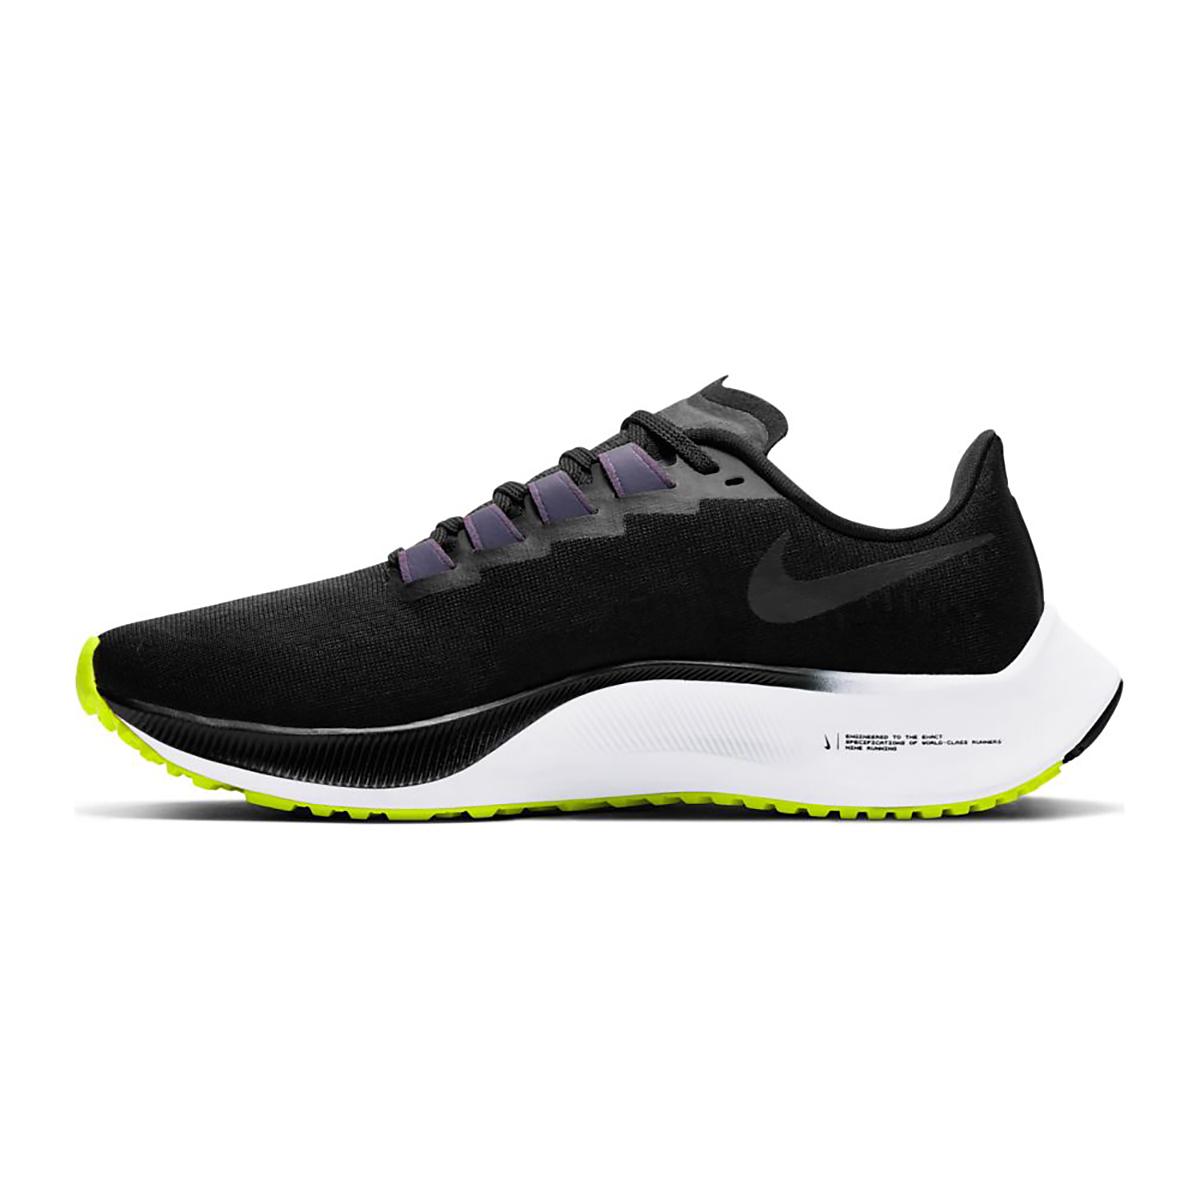 Women's Nike Nike Air Zoom Pegasus 37 Running Shoe - Color: Black/Anthracite/Dark Raisin/White - Size: 5 - Width: Regular, Black/Anthracite/Dark Raisin/White, large, image 2